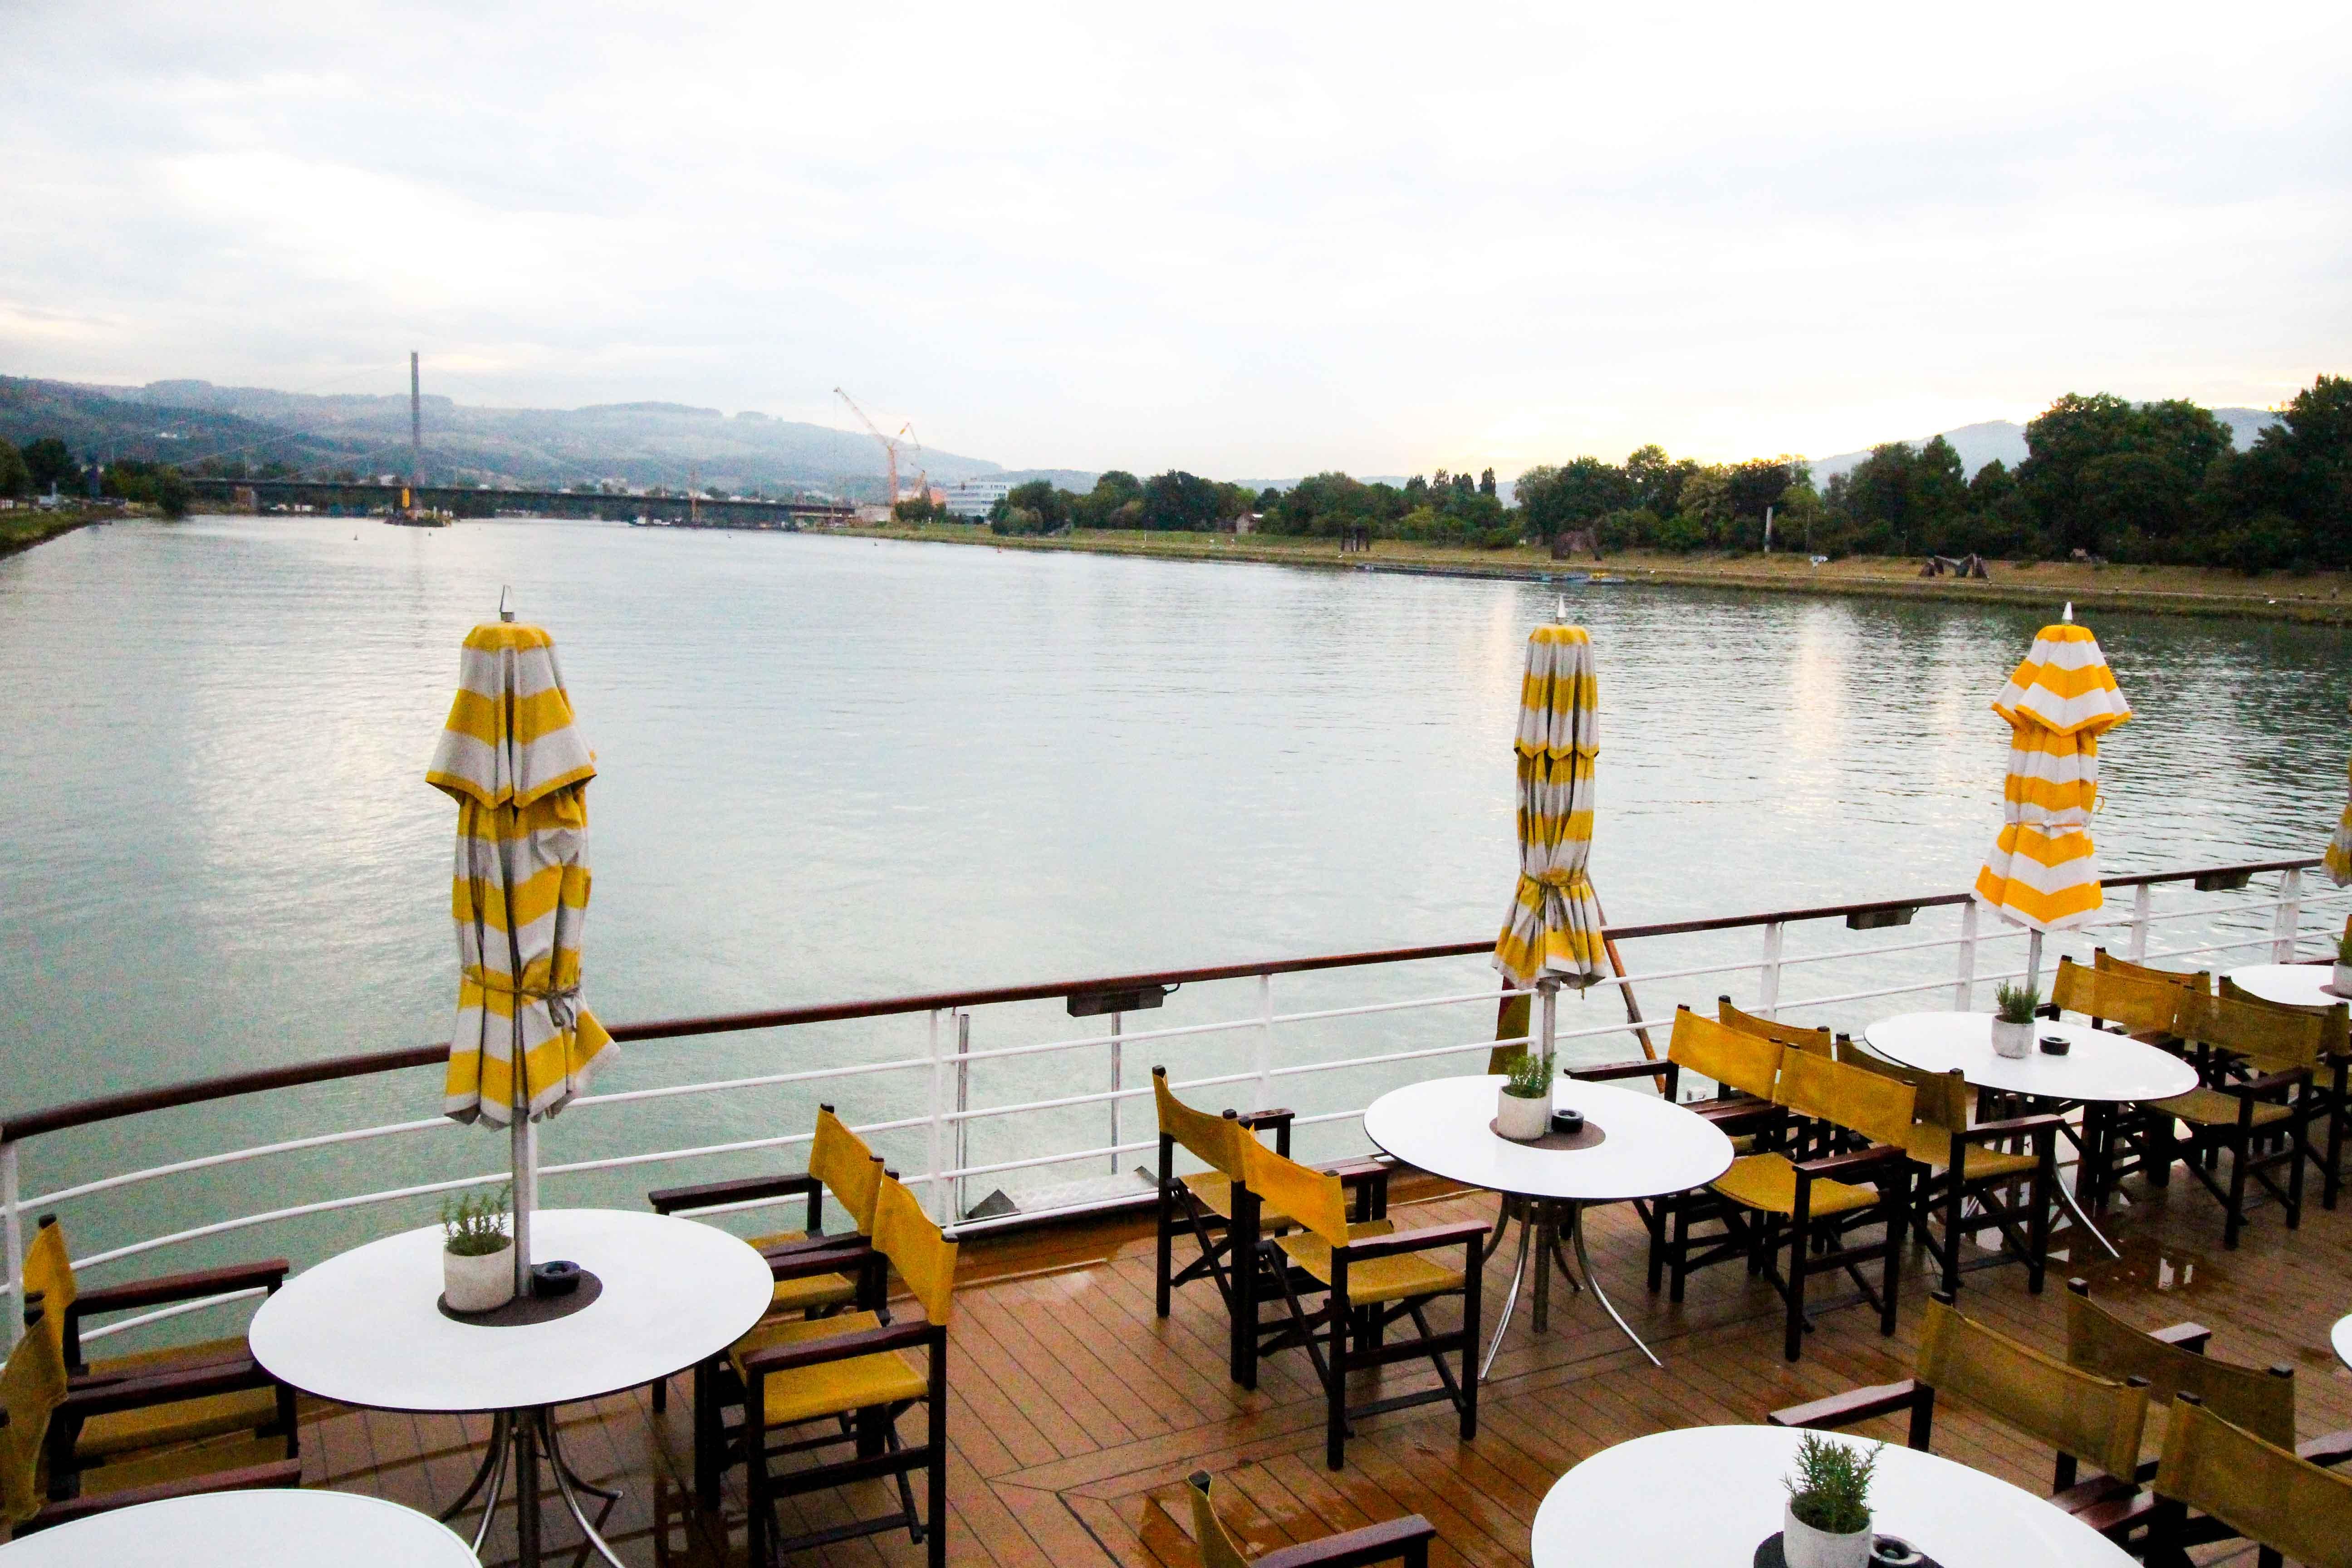 Donaukreuzfahrt A-Rosa Bella Flusskreuzfahrt Sonnendeck Linz Flusskreuzfahrtschiff Donau Melk 7 Tage Donau Klassik Tour Arosa Reiseblogger 2